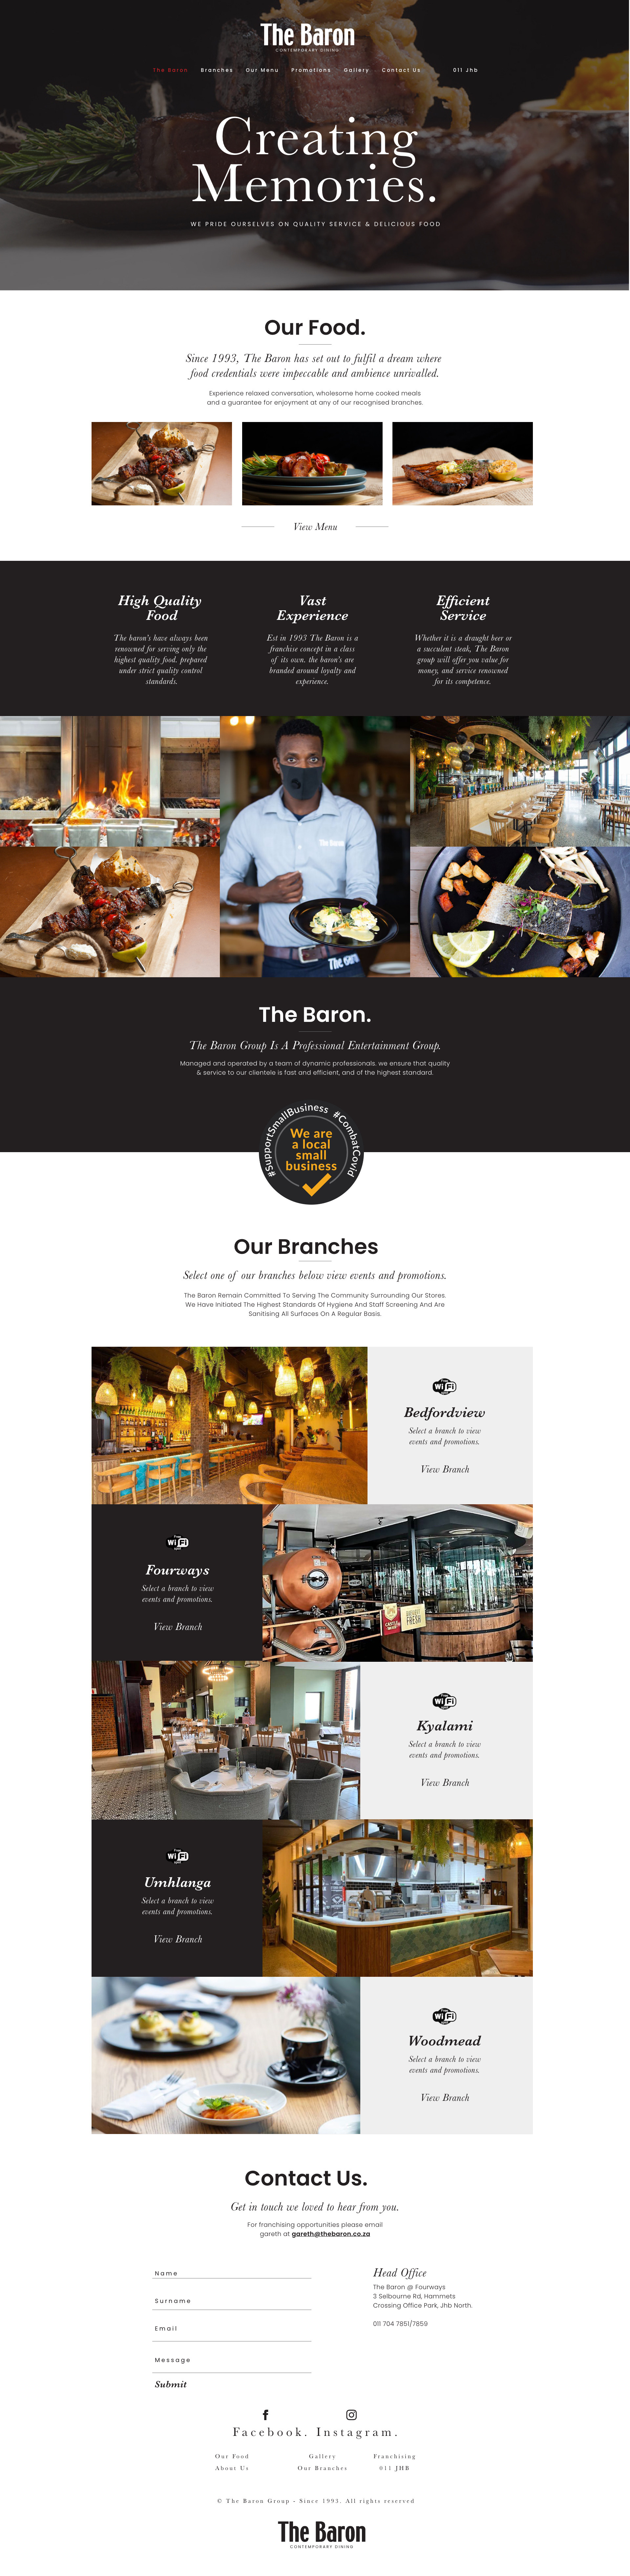 The-Baron-homepage.jpg